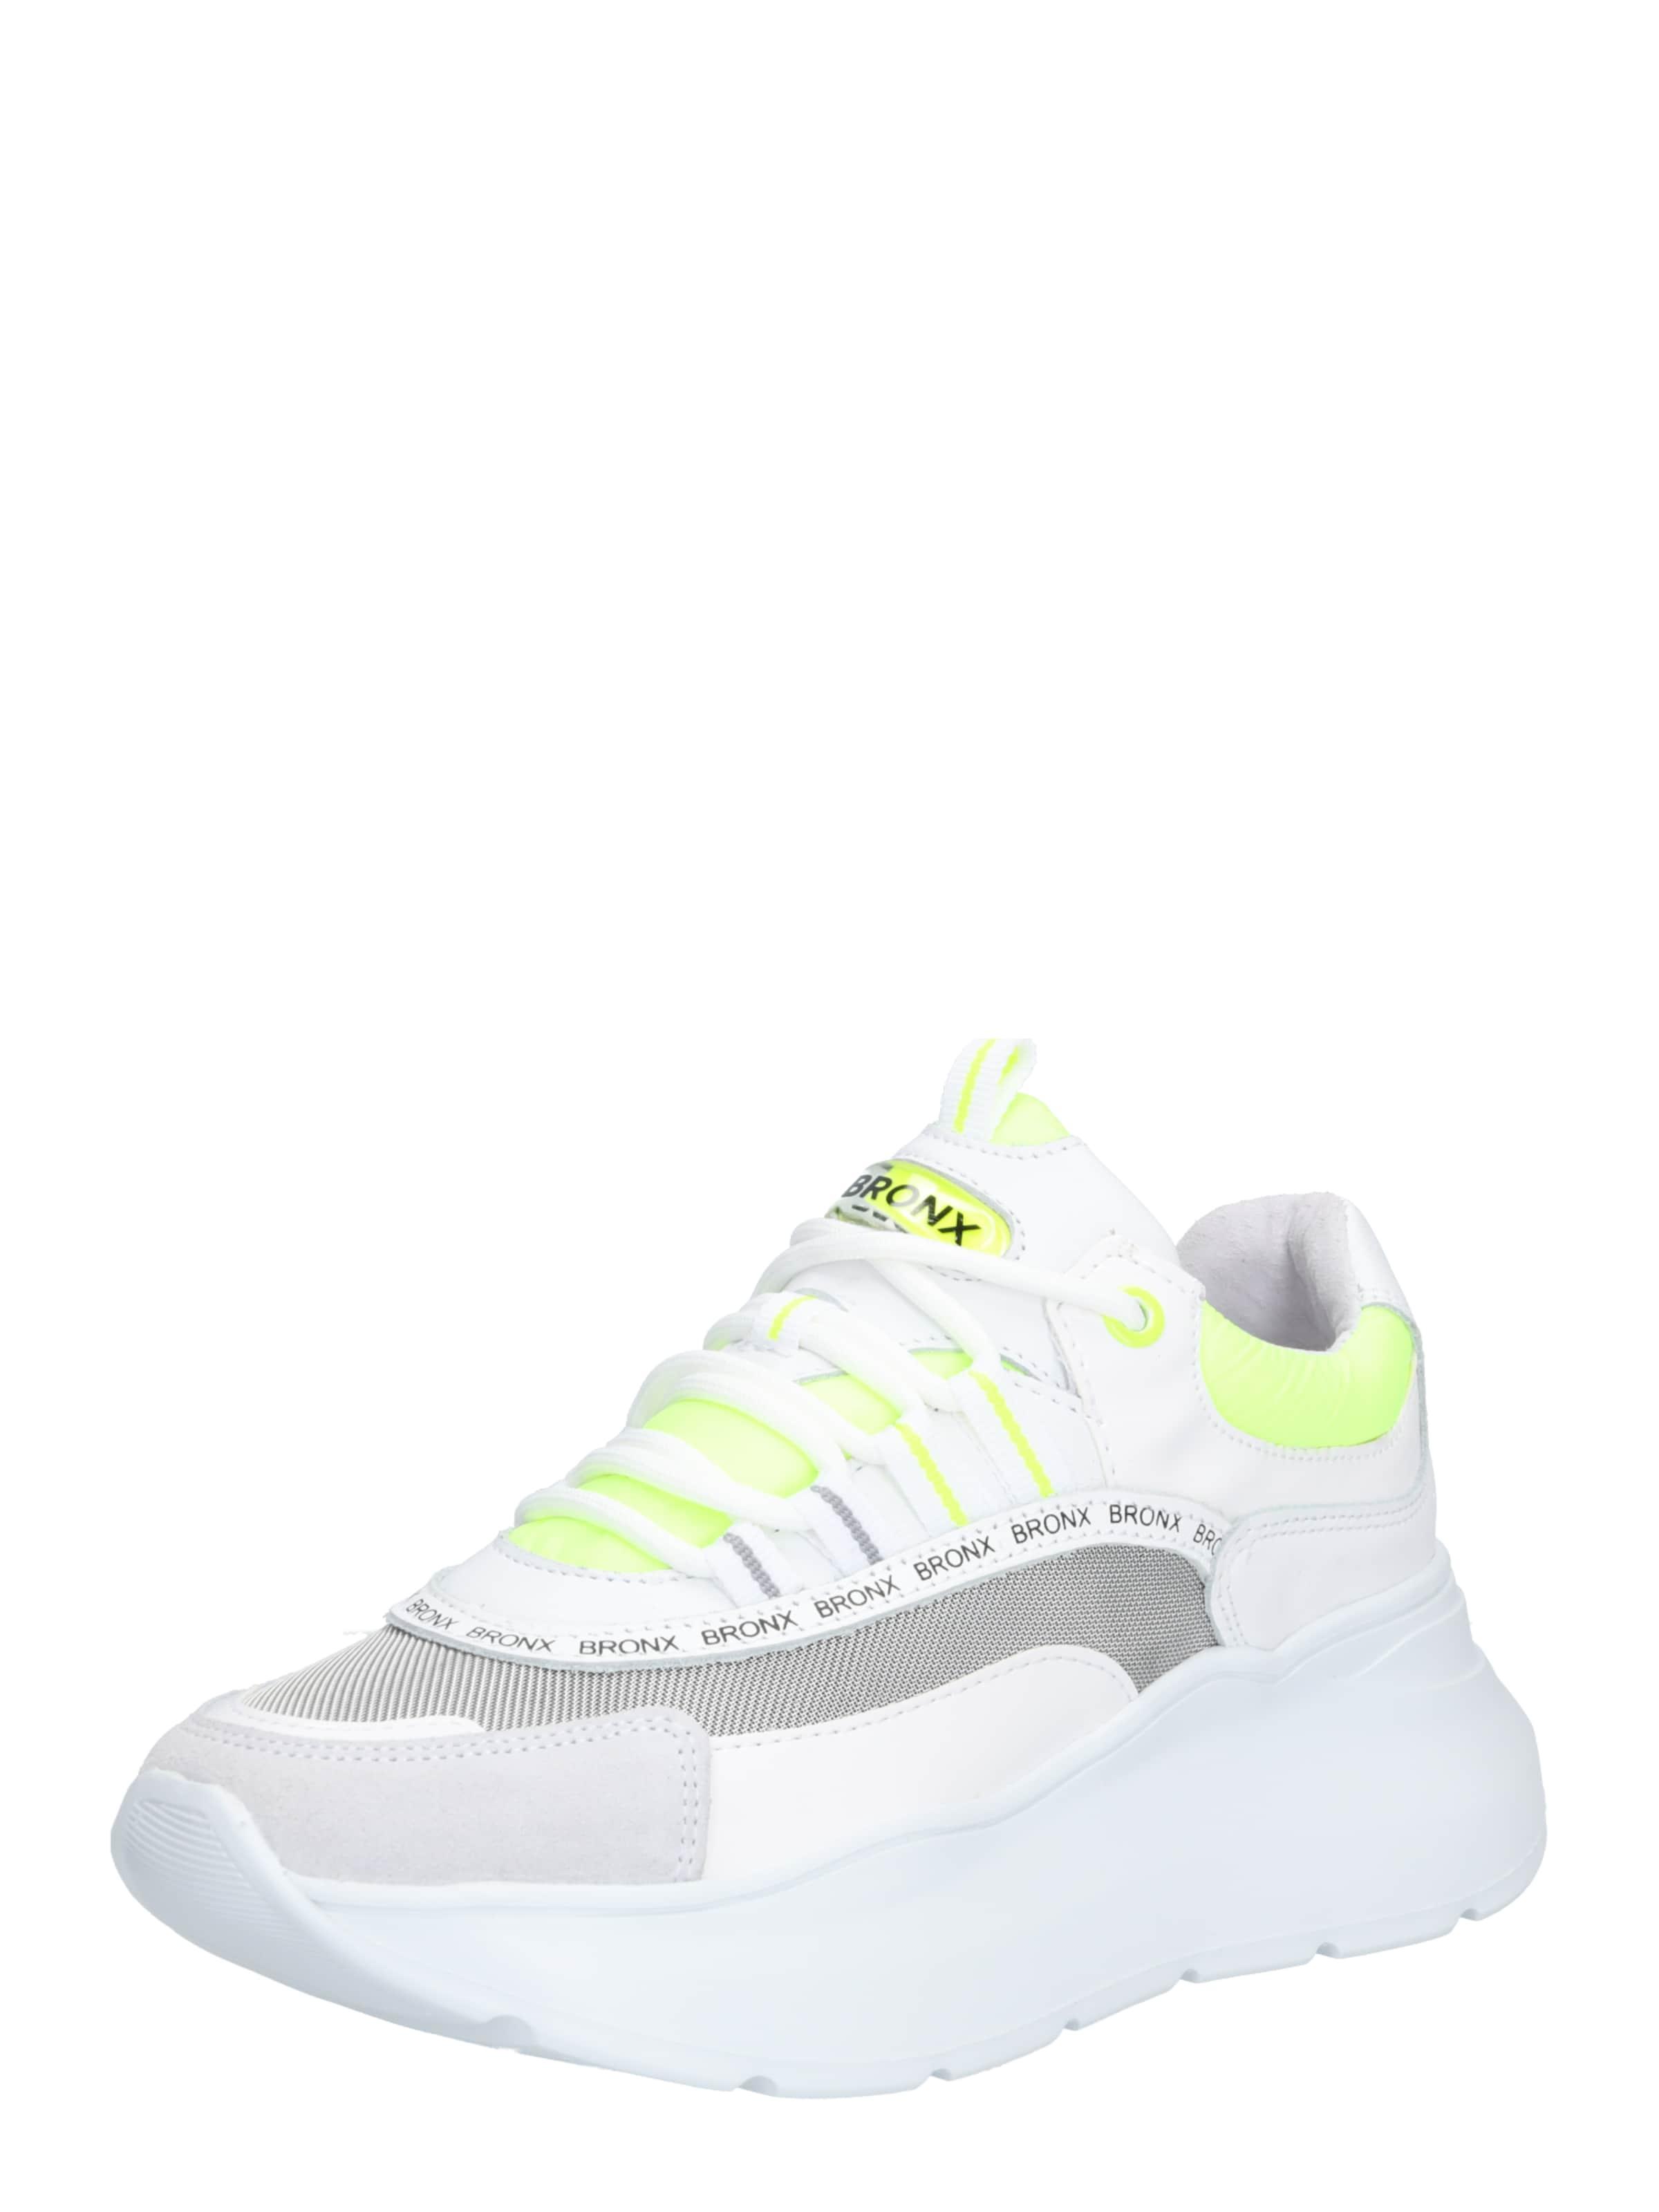 'grayson' Bronx In GelbGrau Sneaker Weiß XikuOPZT